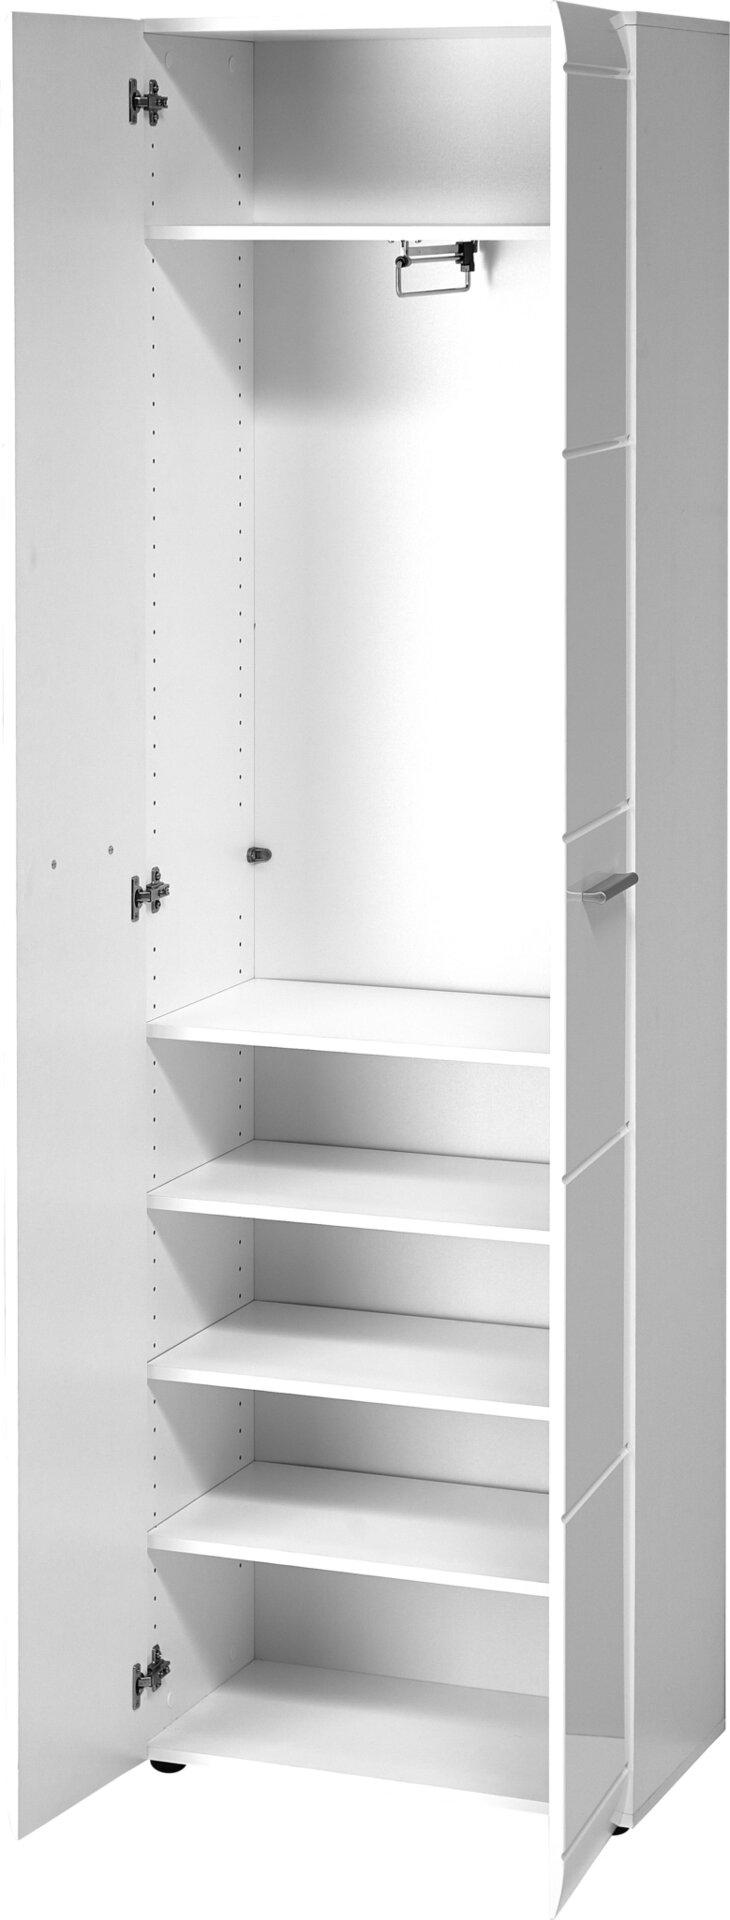 Garderobenschrank ADANA Germania Holzwerkstoff weiß 37 x 197 x 59 cm